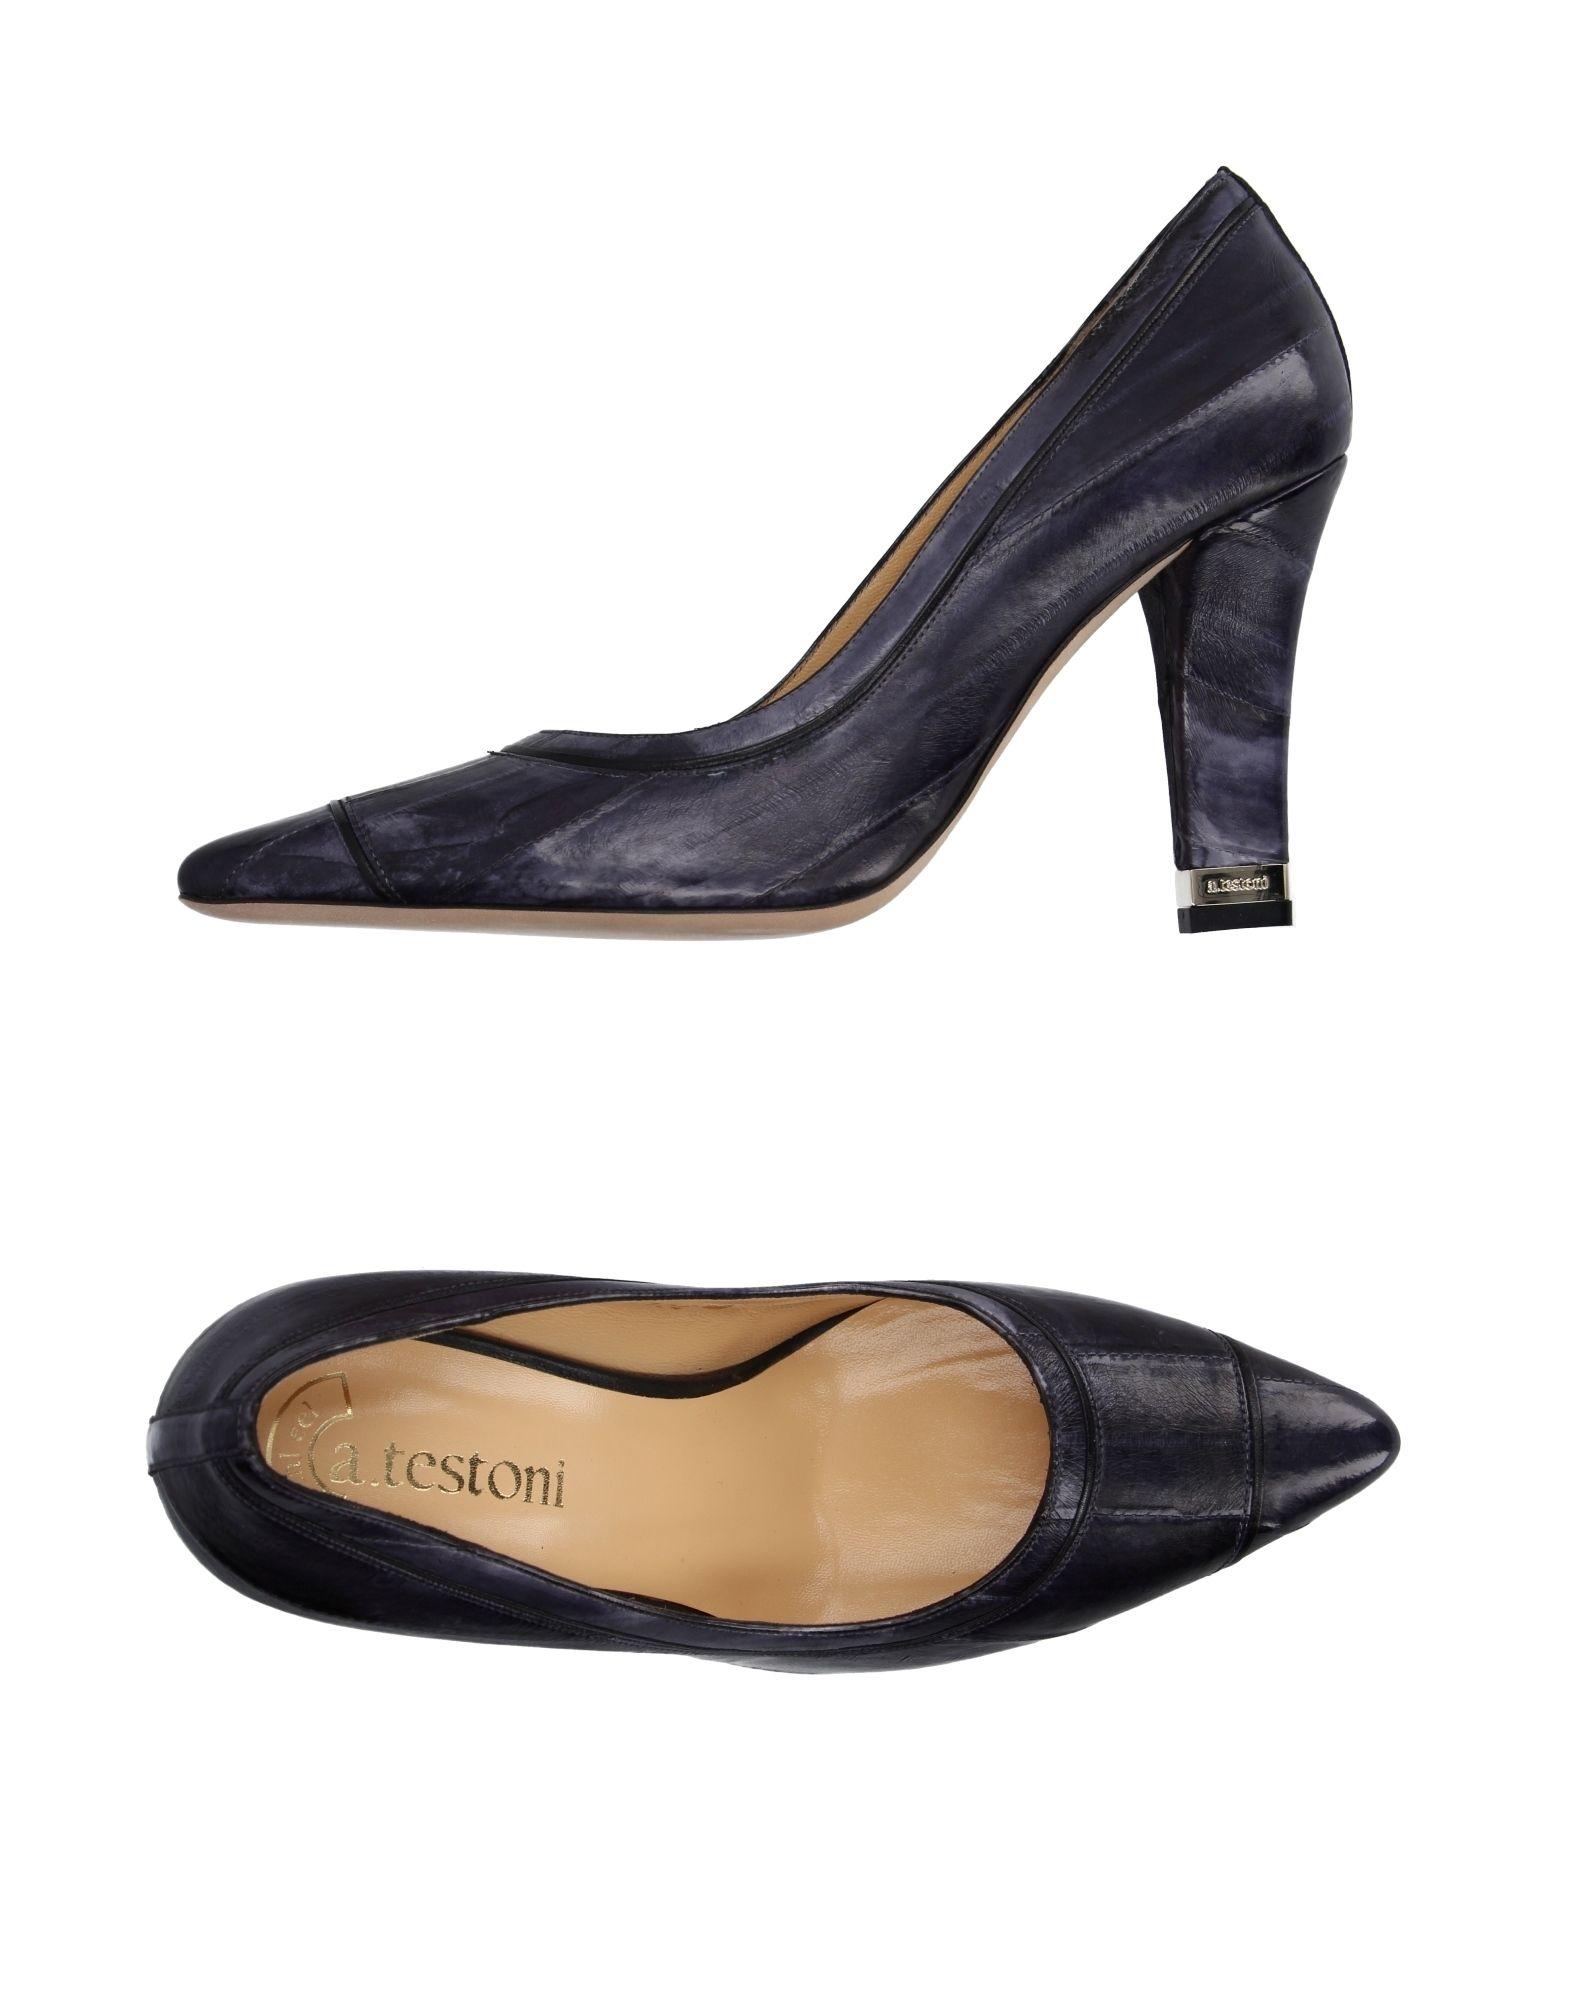 Stilvolle billige  Schuhe A.Testoni Pumps Damen  billige 11281318NT 8e8a06